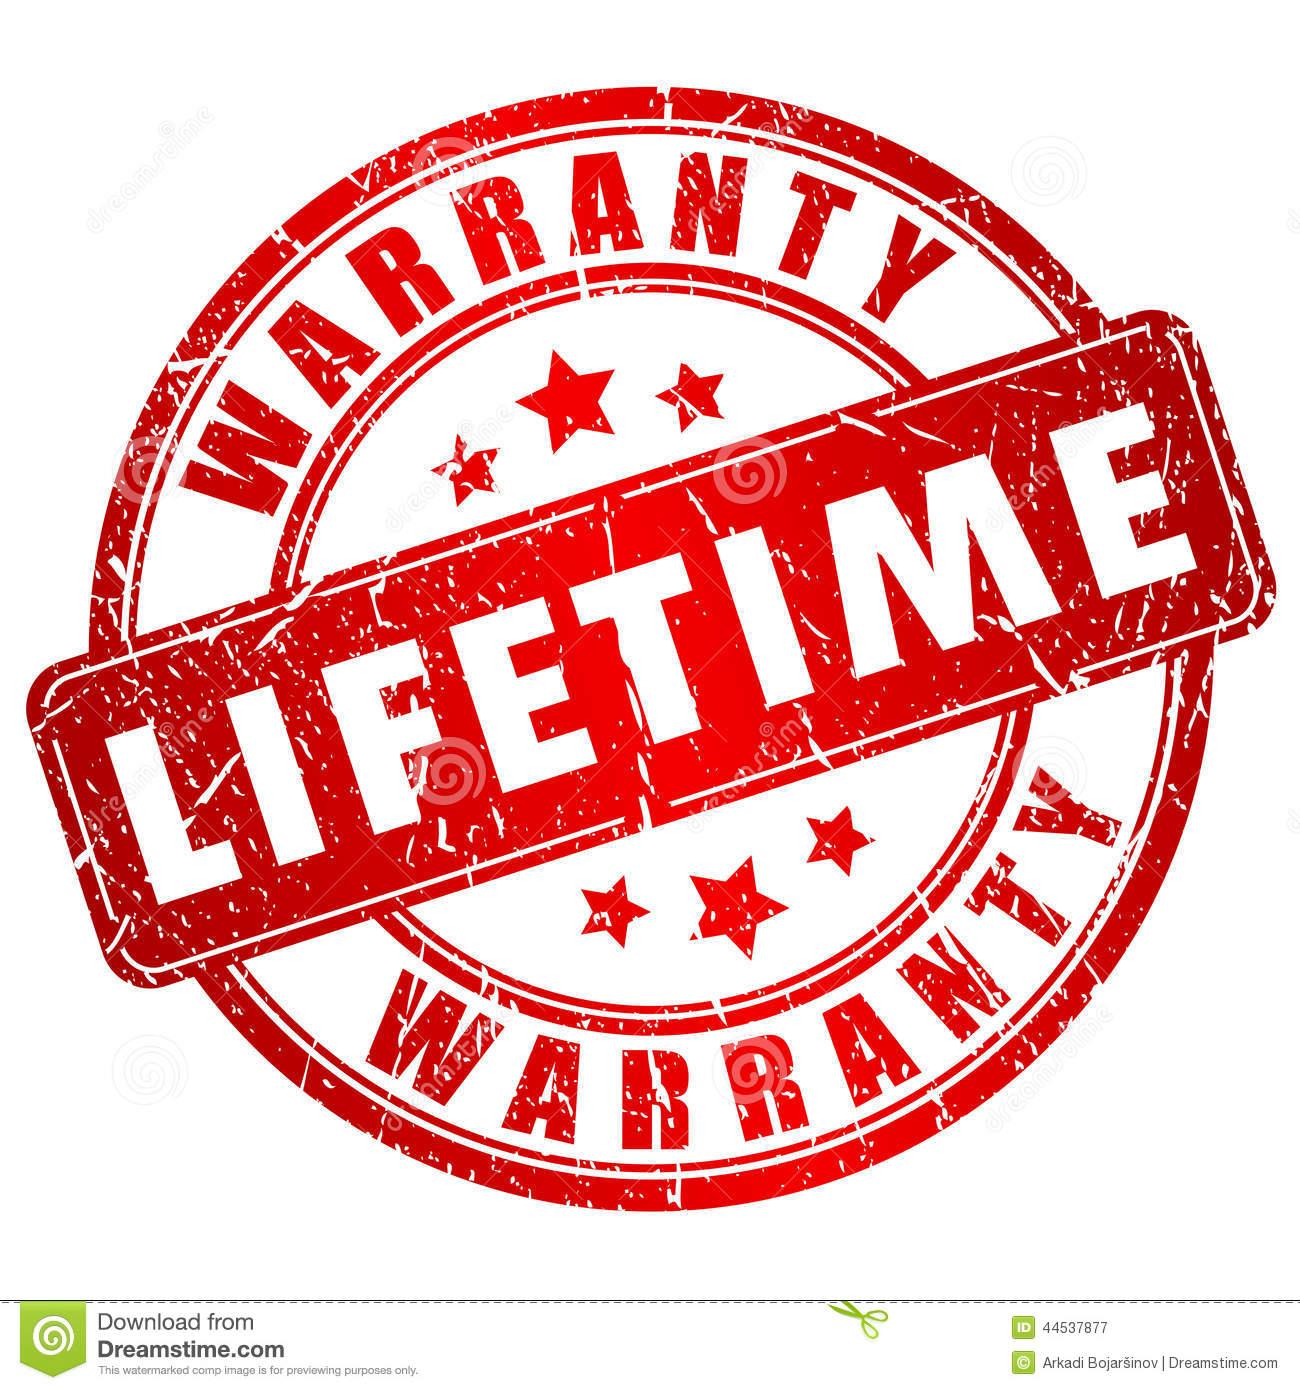 Lifetime logo clipart clipart freeuse stock Lifetime warranty stamp | Clipart Panda - Free Clipart Images clipart freeuse stock